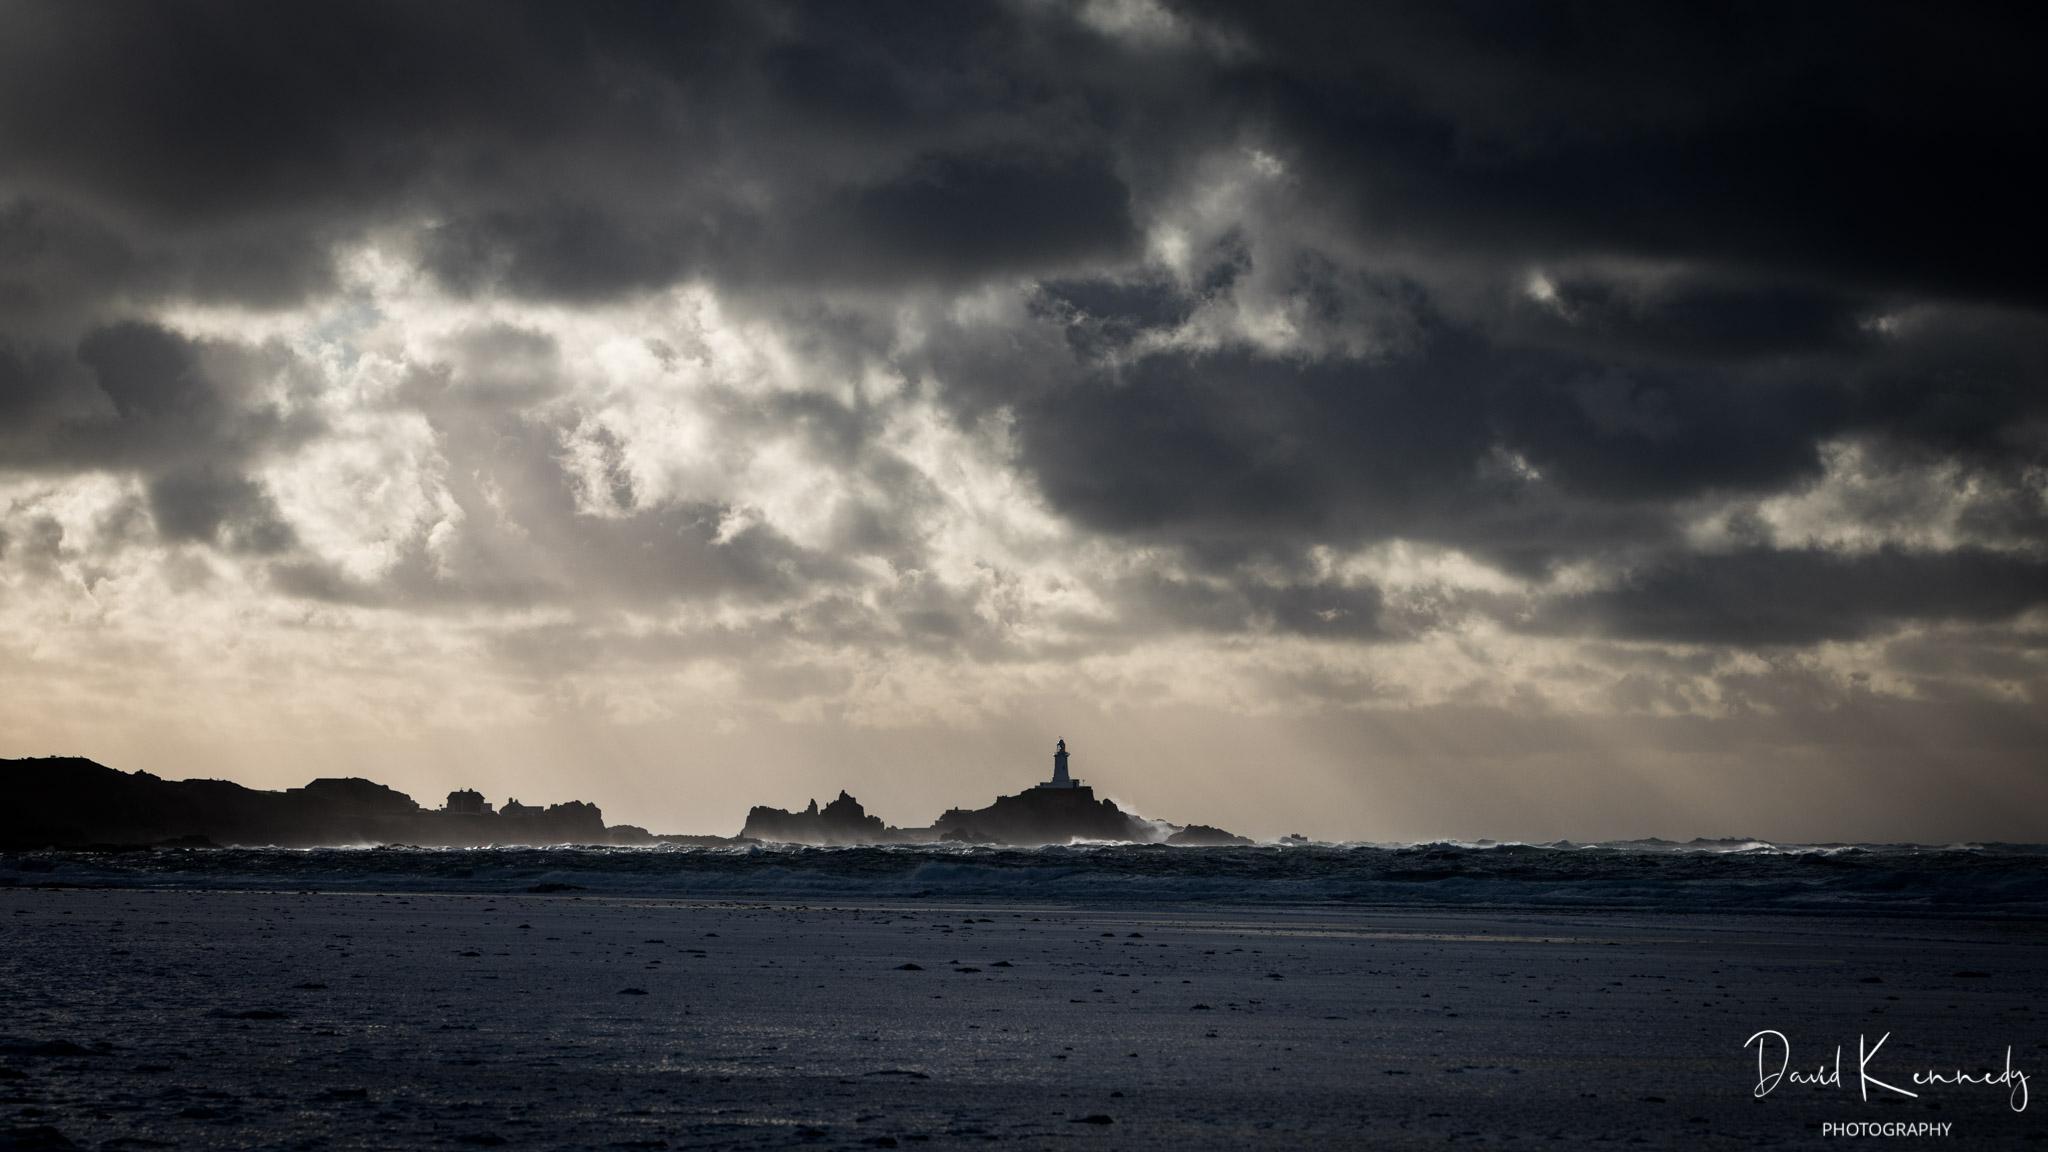 A dramatic seascape and sky